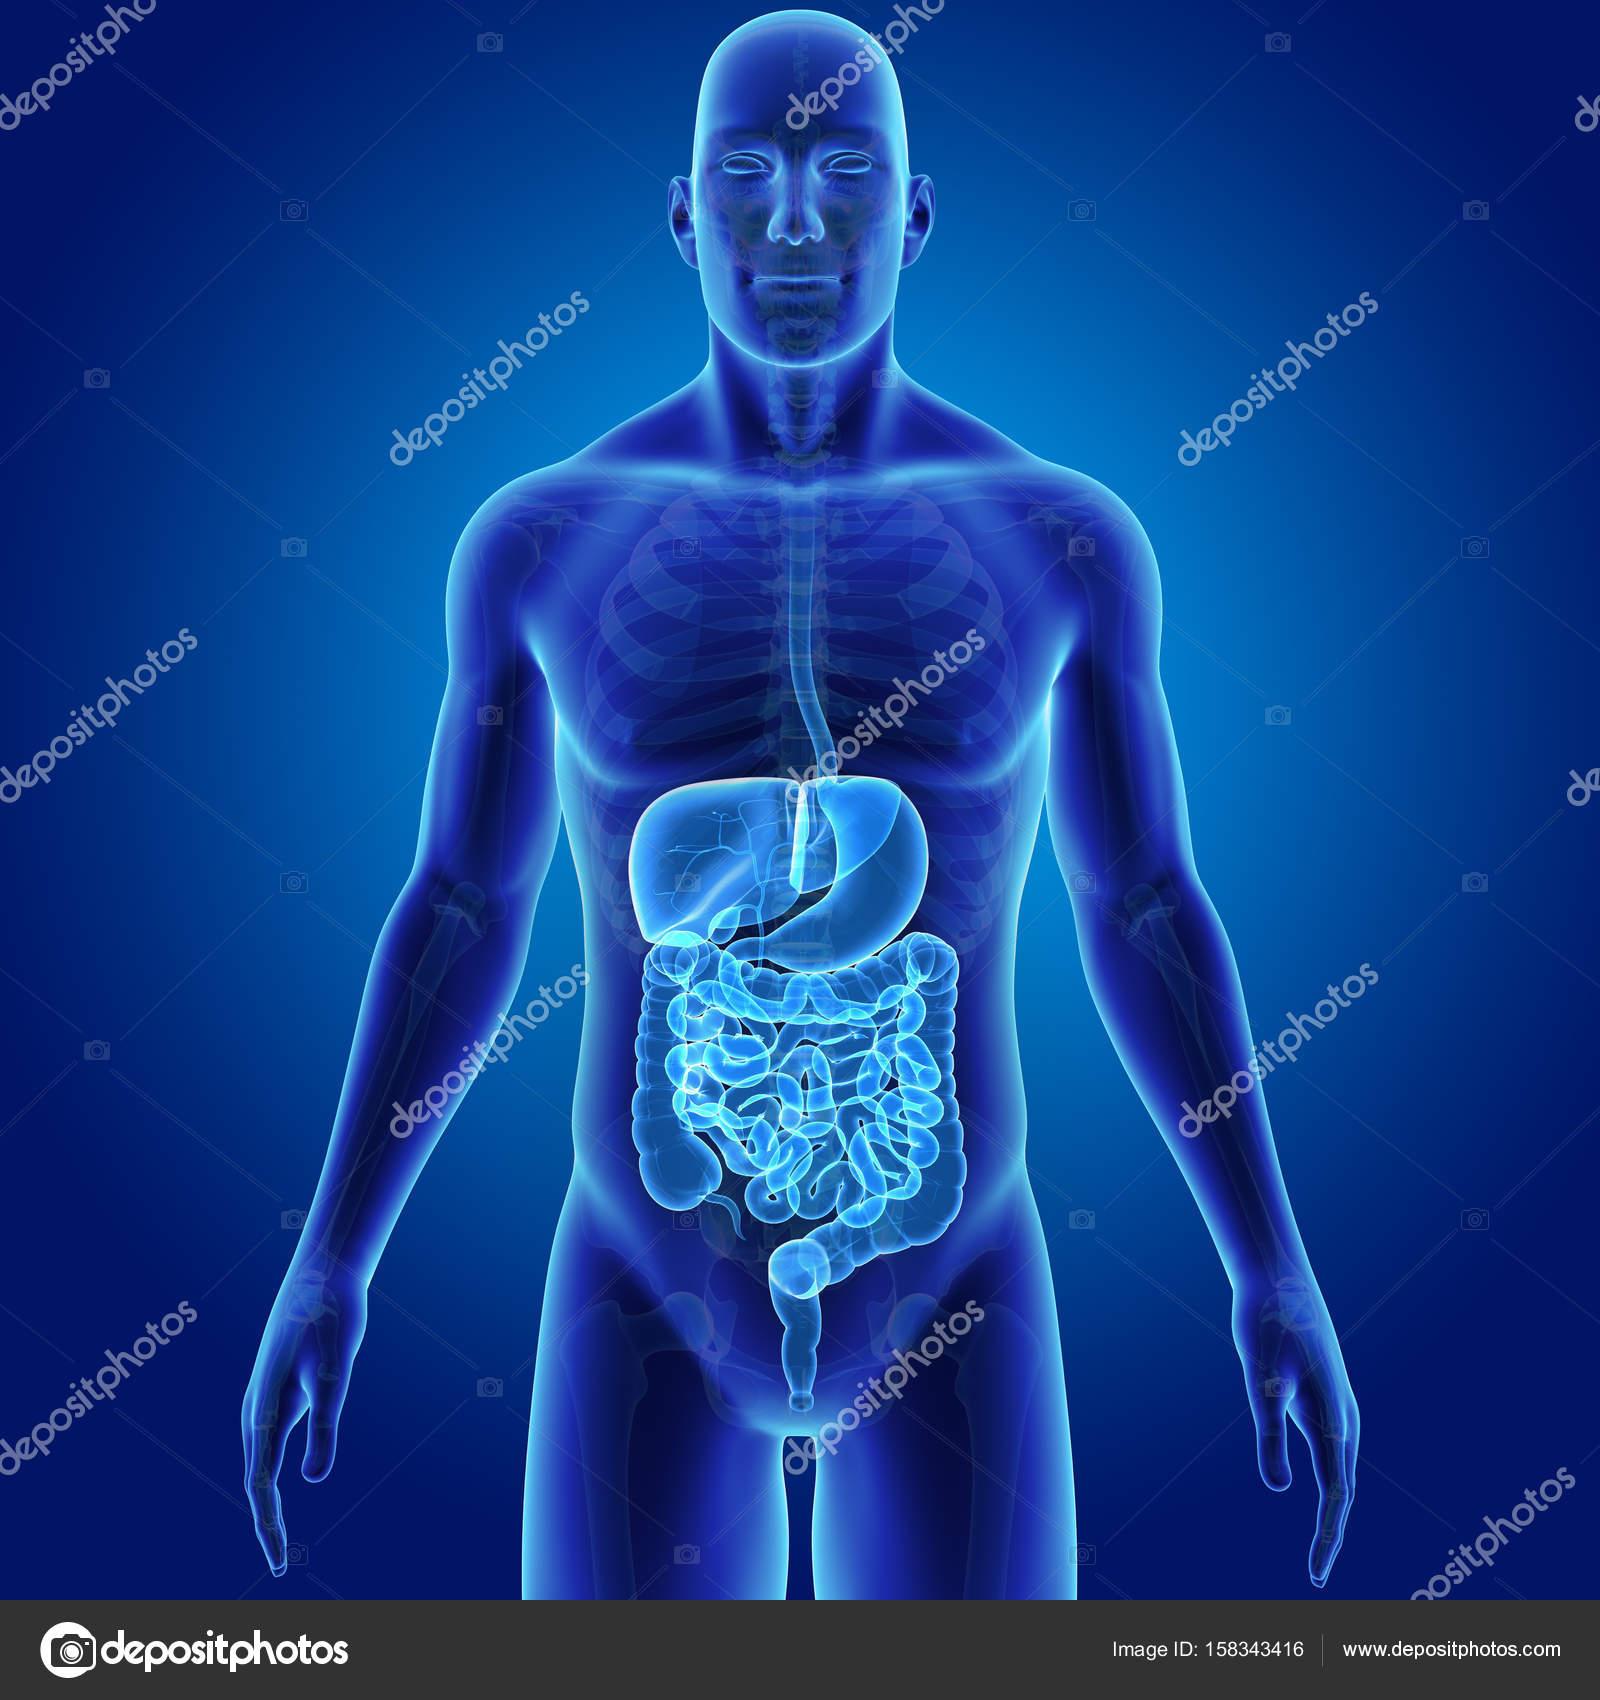 Verdauungssystem mit Skelett — Stockfoto © sciencepics #158343416